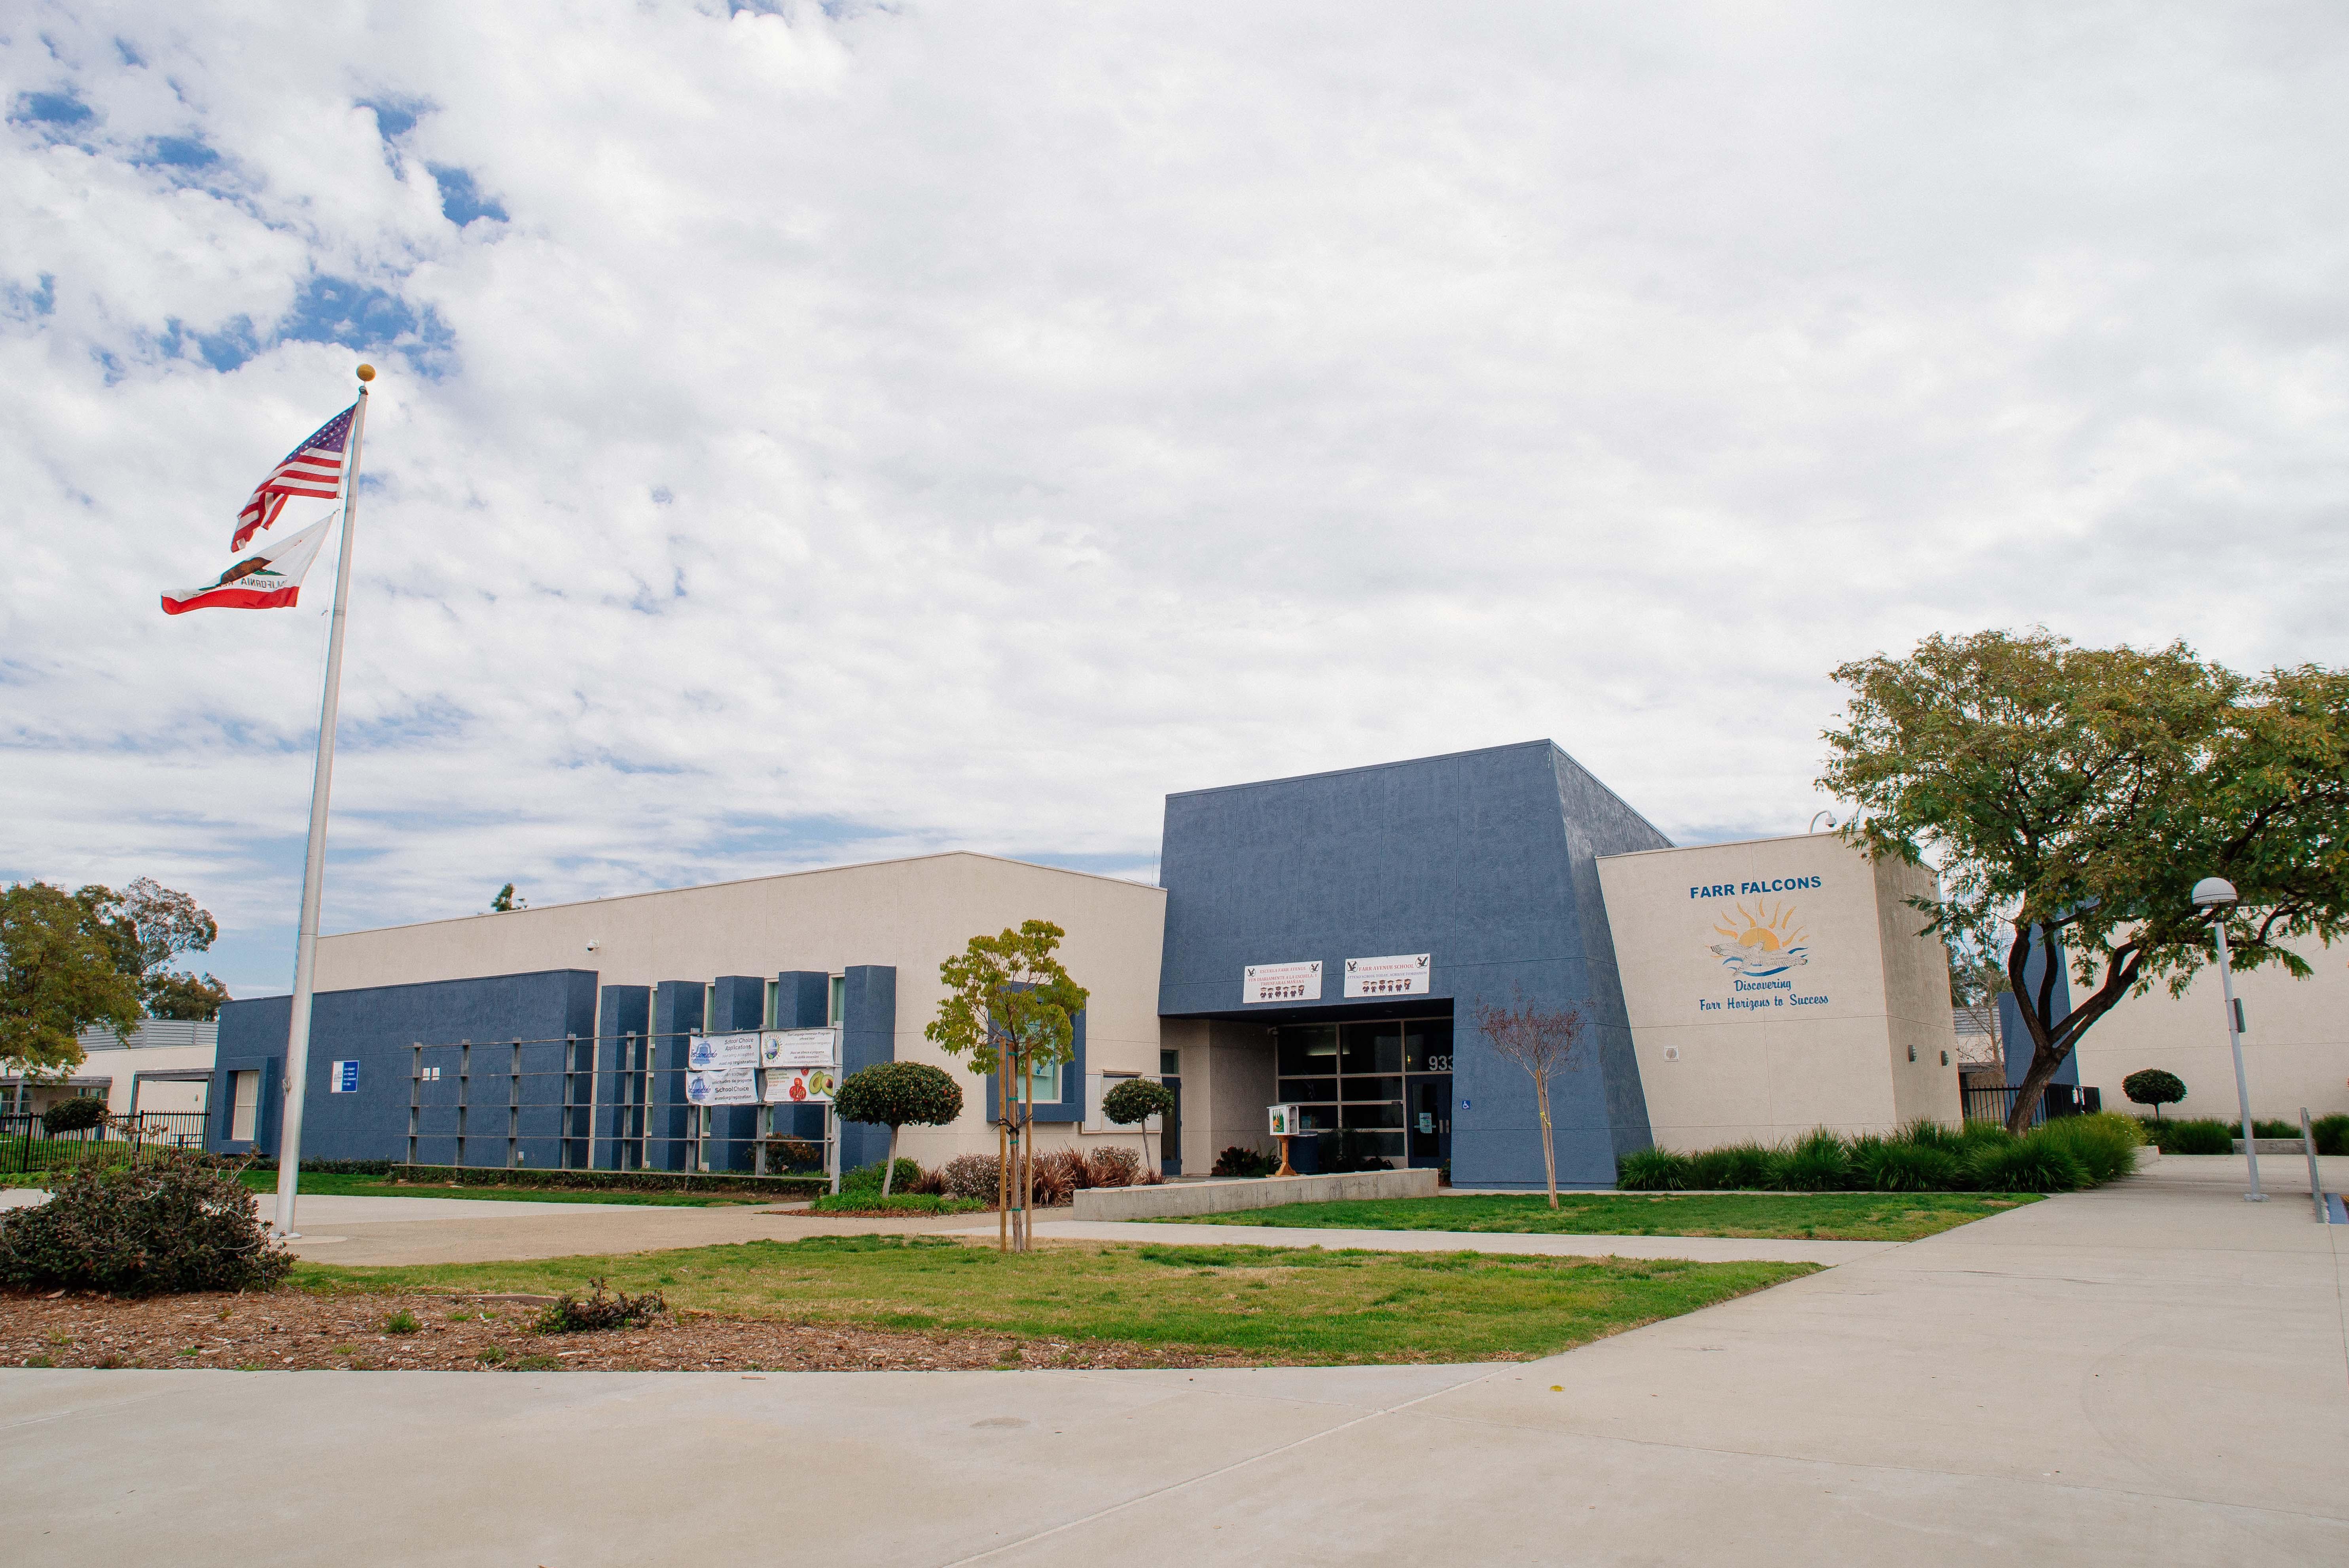 Farr Avenue Elementary